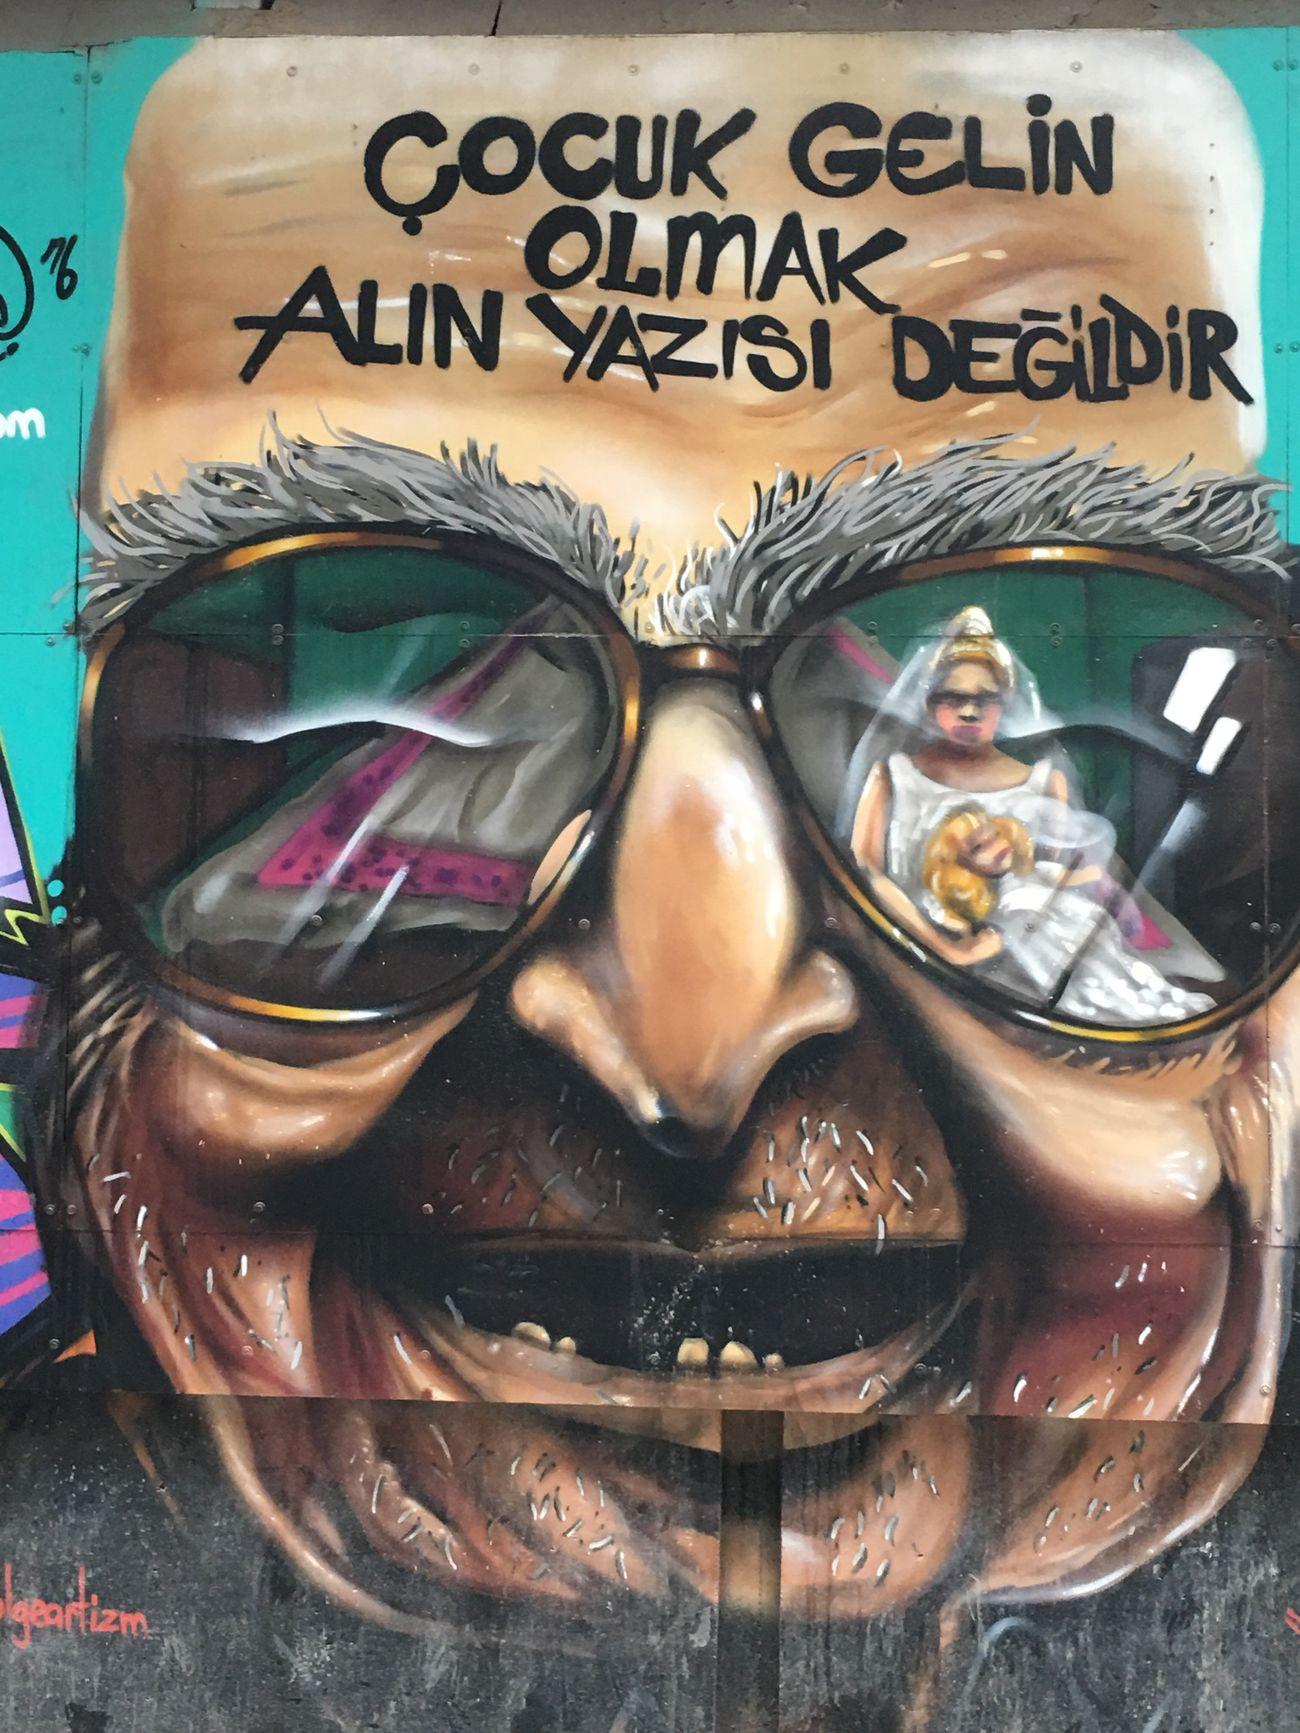 Taksim Istanbul Beylikduzu Avcılar Besiktas Bebek Self Selfie ✌ Selfportrait Selfie ♥ Models Model Tattoo